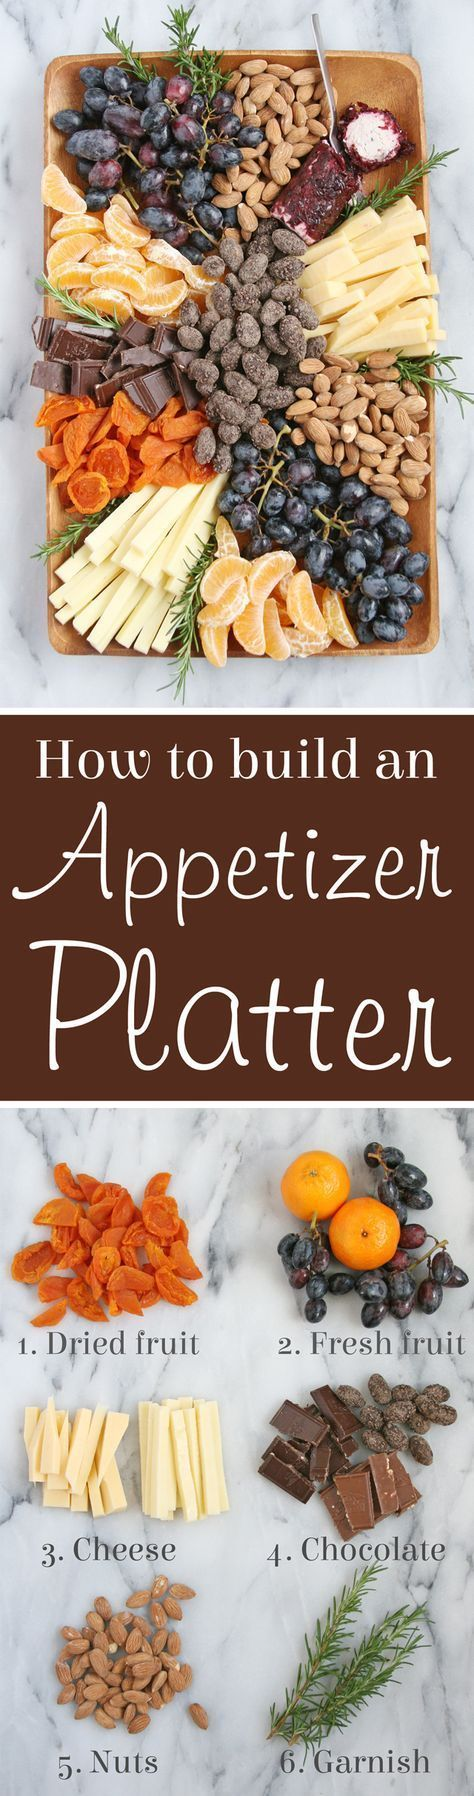 #appetizer #beautiful #appetizer #beautiful #healthy #healthy #platter #fitness #gourmet #healthy #p...